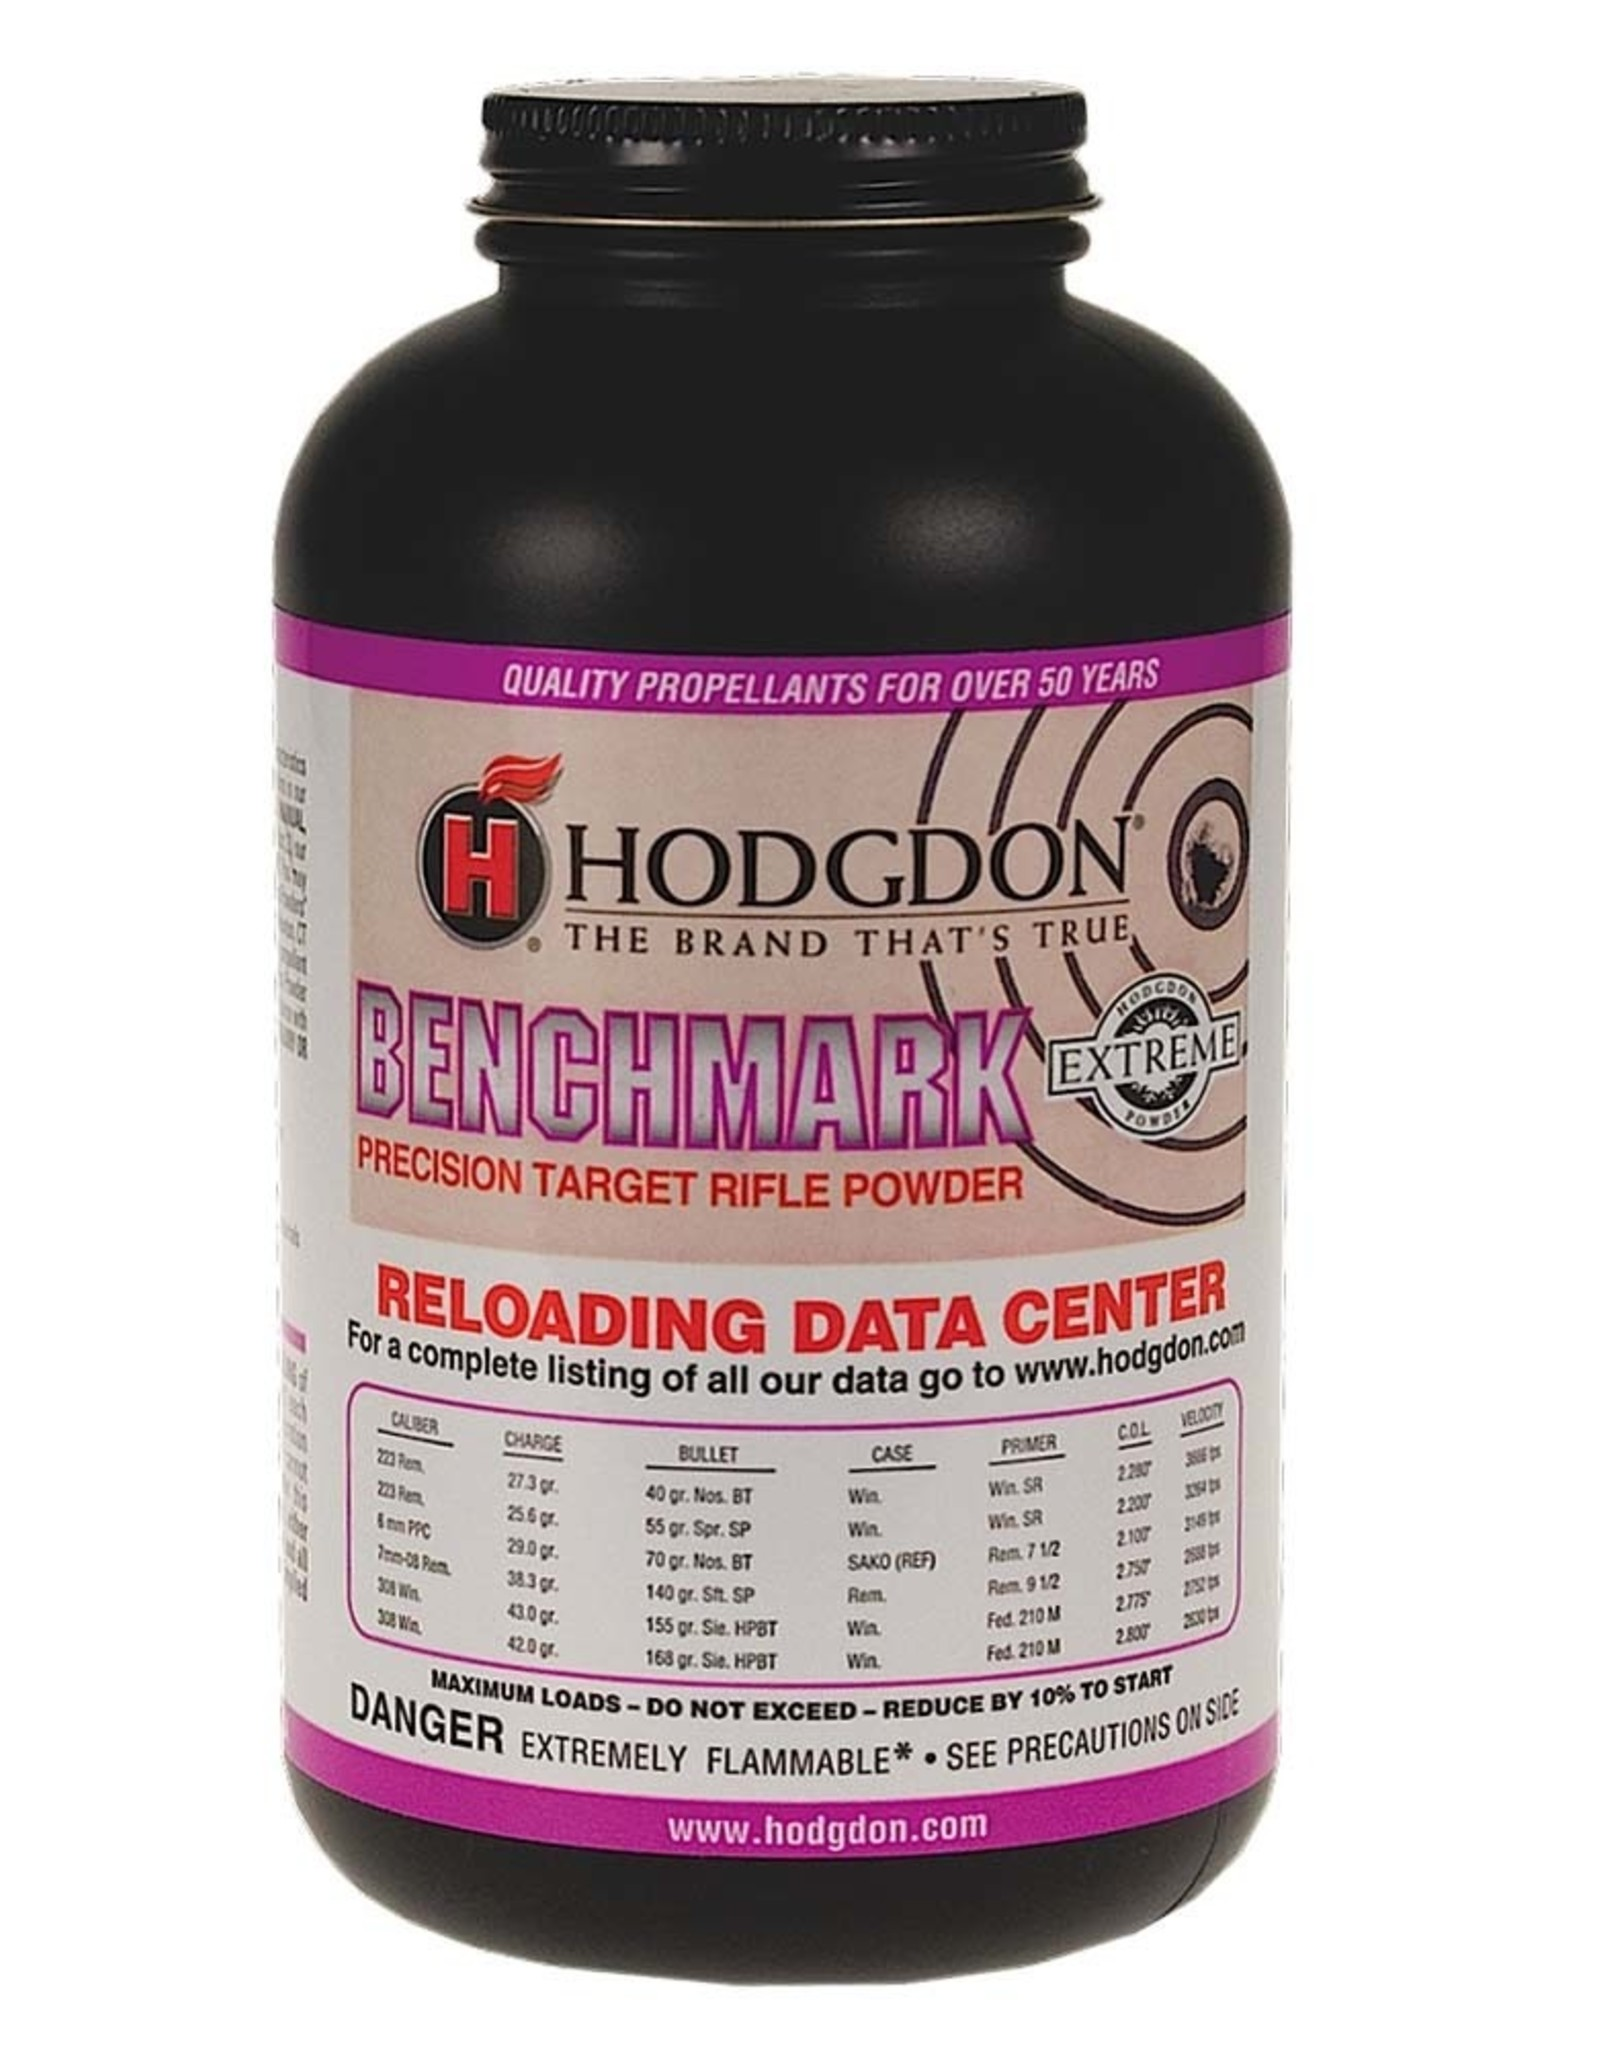 Hodgdon Hodgdon Benchmark Extreme Rifle